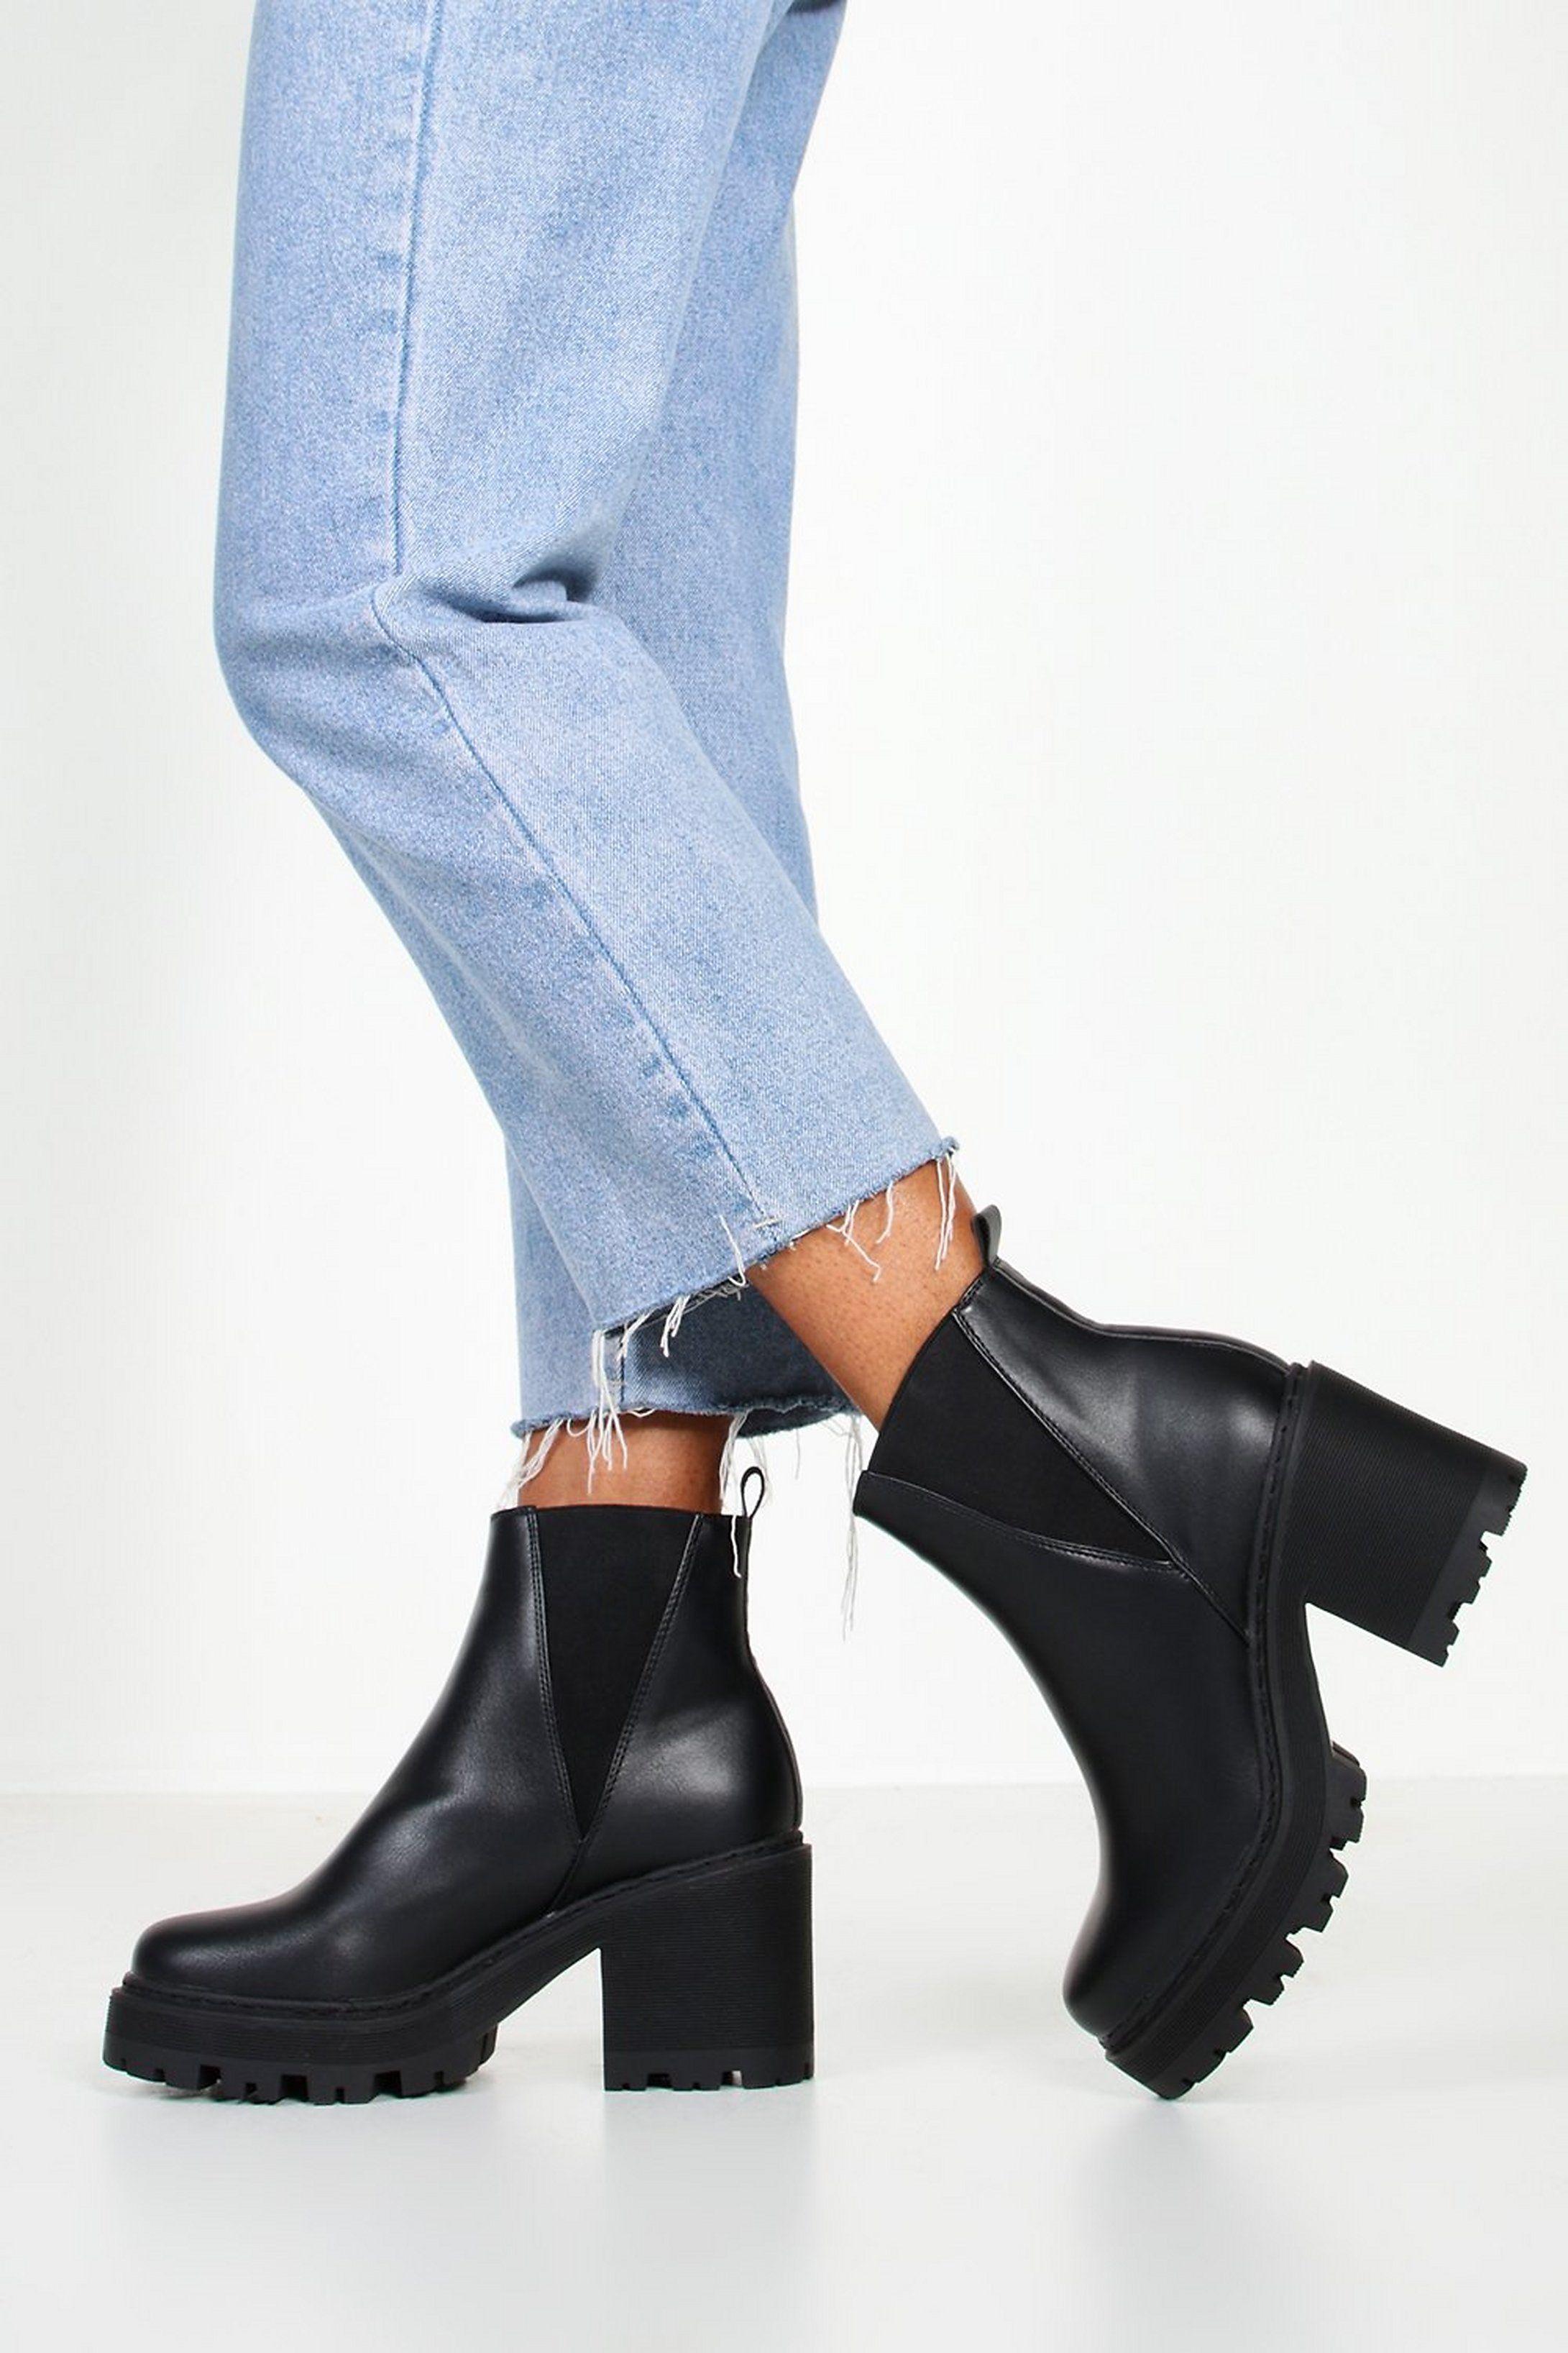 Wide Width Chunky Block Heel Chelsea Boots Boohoo Heels Boots Outfit Chelsea Boots Outfit Black Chelsea Boots